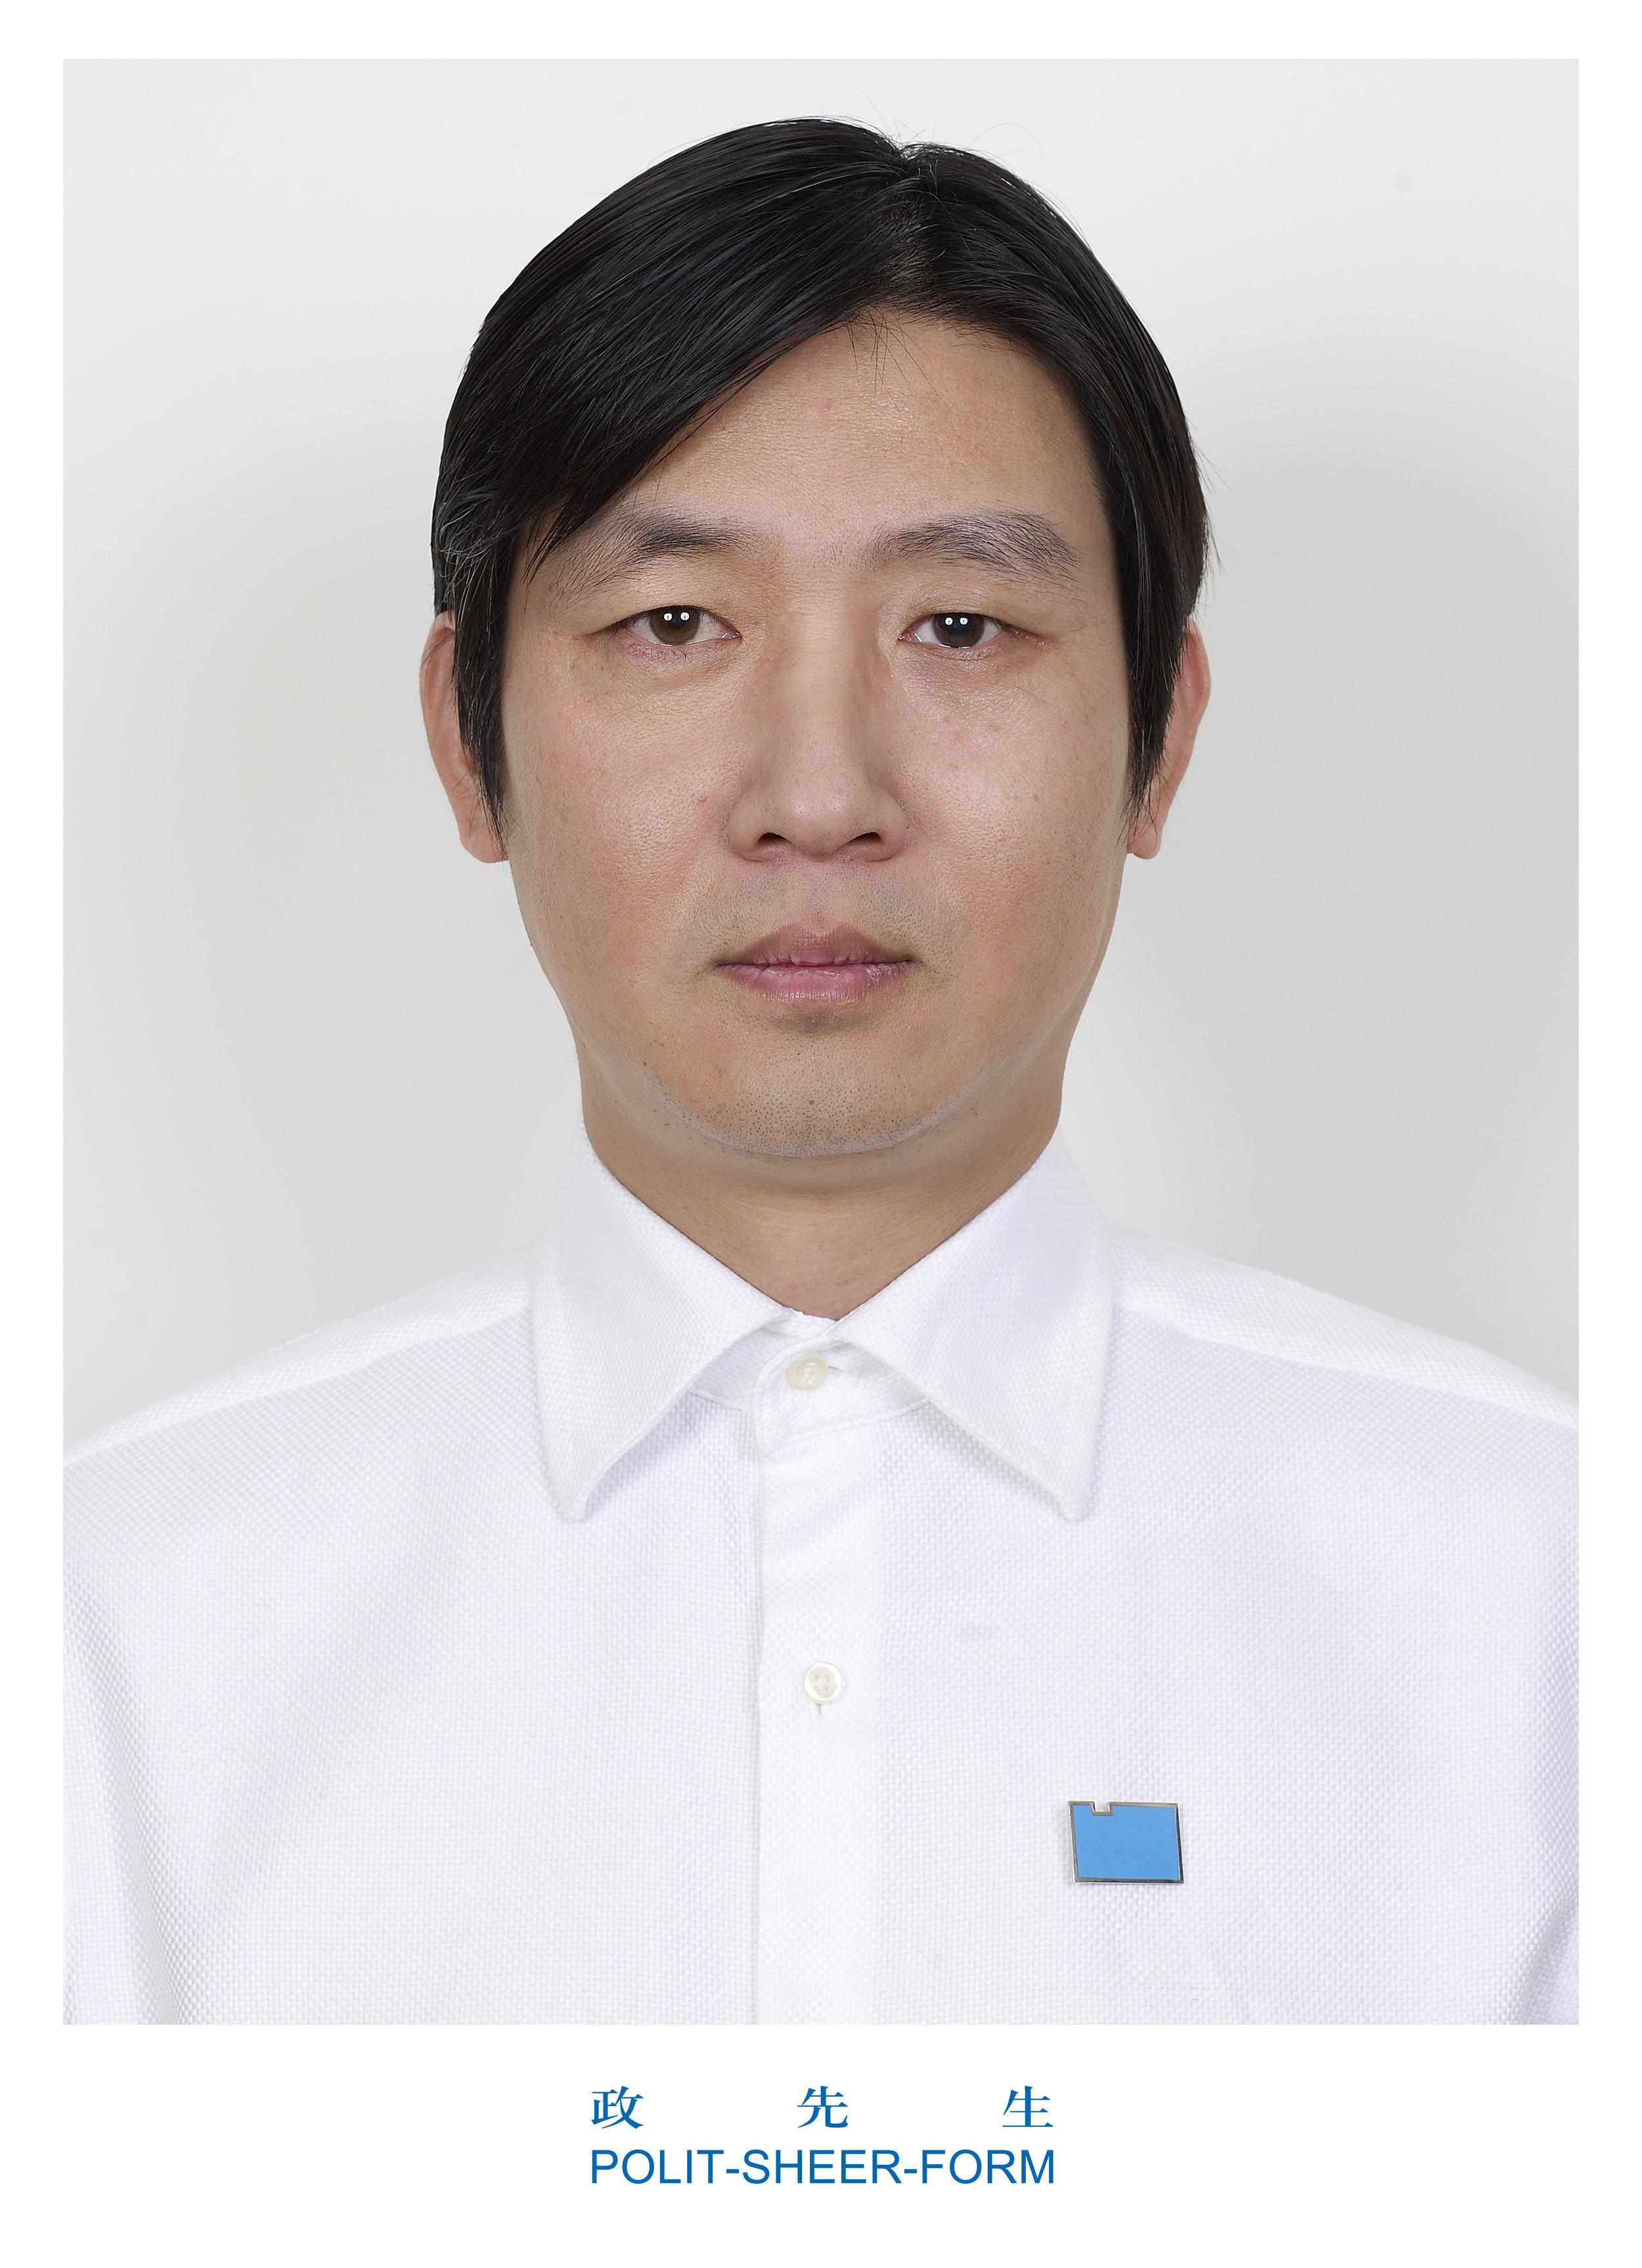 Mr Zheng  - by Polit-Sheer-Form Office (PSFO)